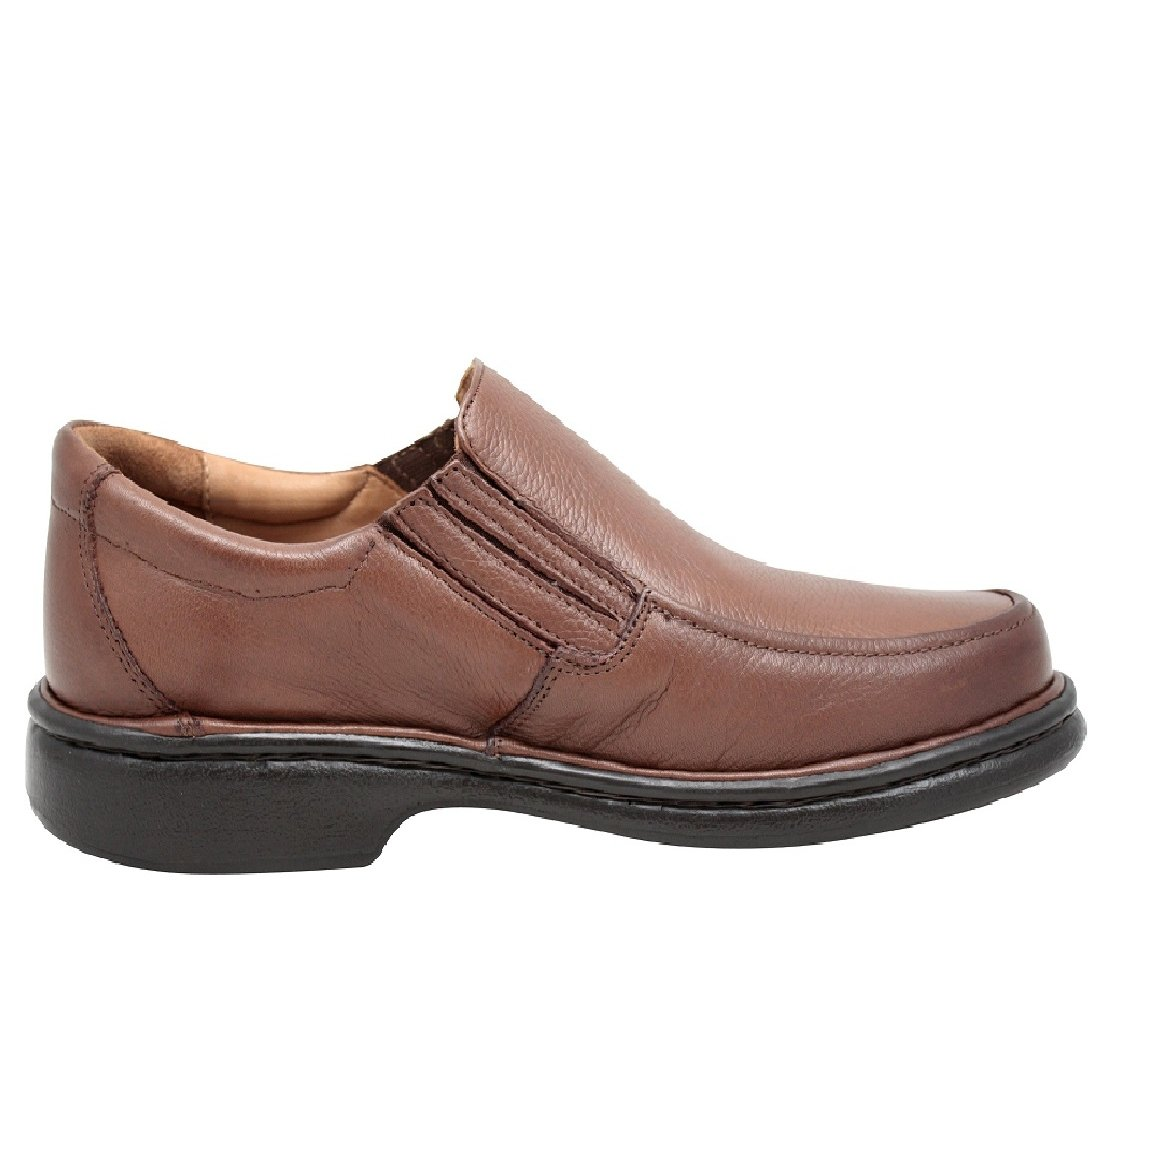 Sapato Sapato Marrom Masculino Shoes Masculino Atron Marrom Sapato Social Masculino Social Atron Shoes Atron Social AAwUqraz